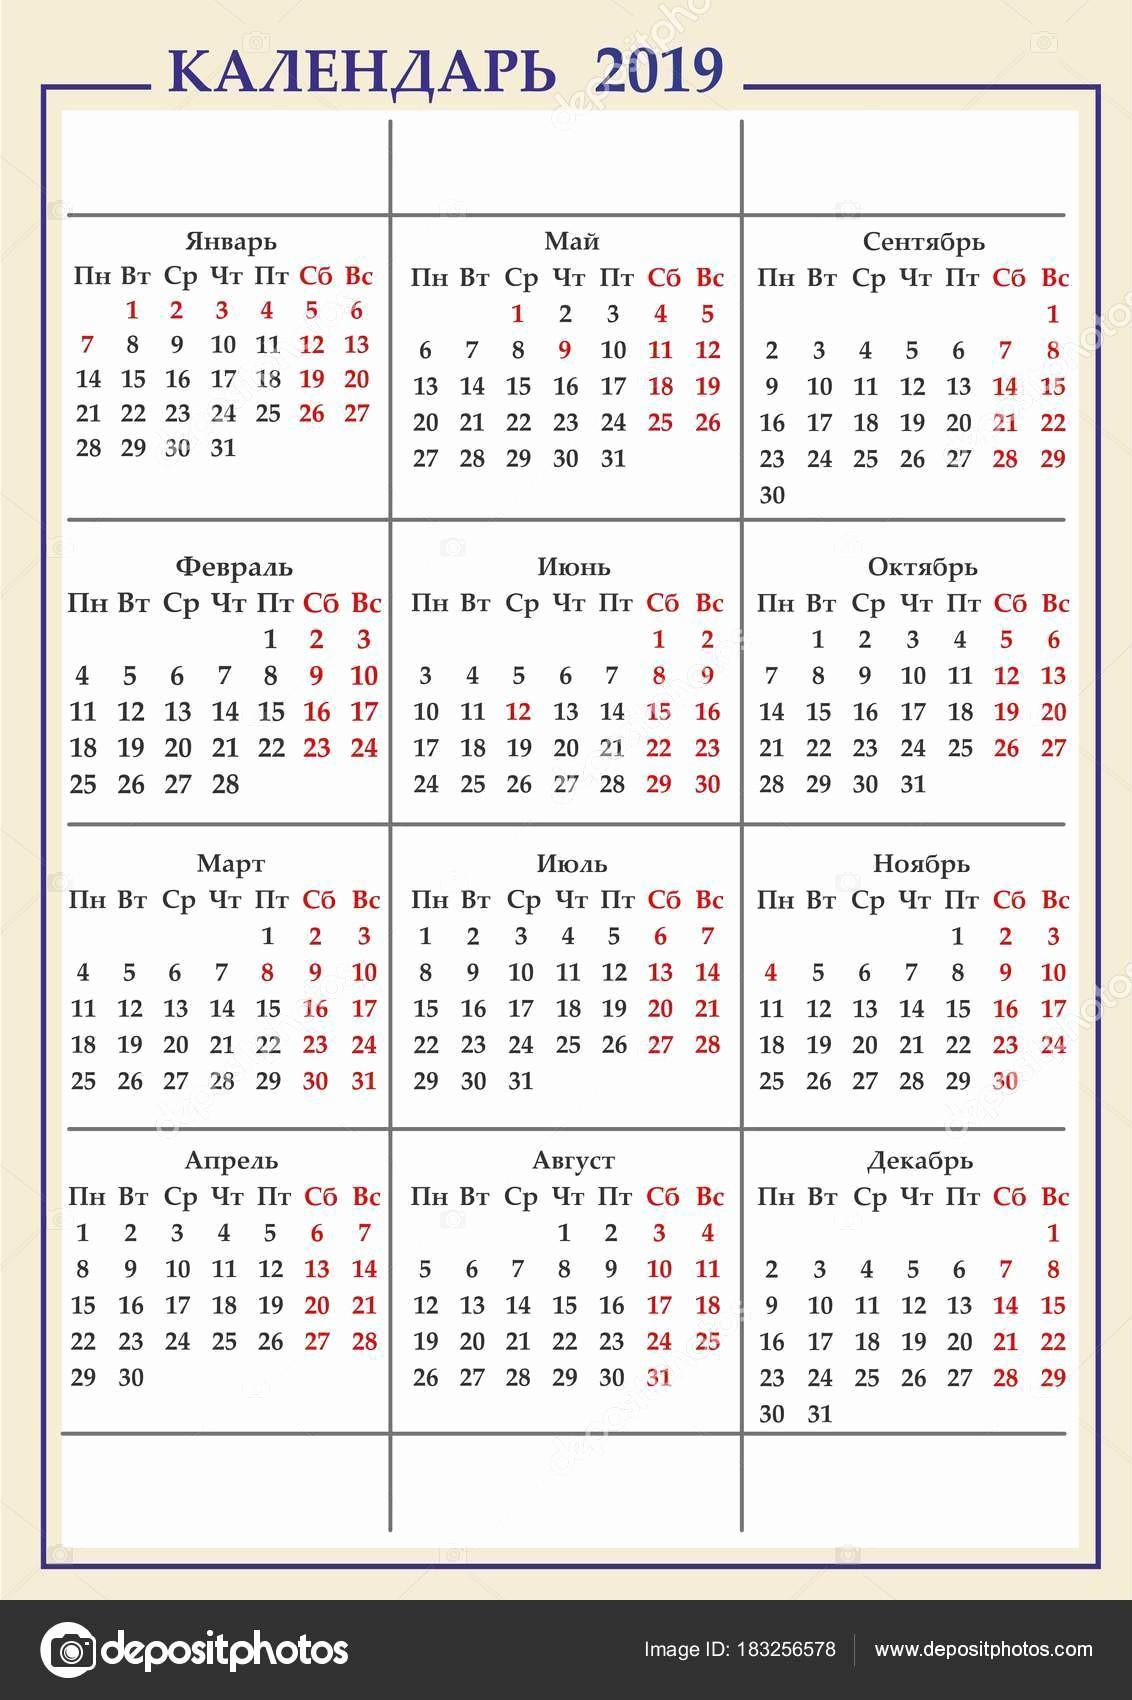 Calendario 2019 Con Festivos Excel Más Reciente Vaselina Calendario De Amor 2019 Calendario 2019 Rusia Vector Vector